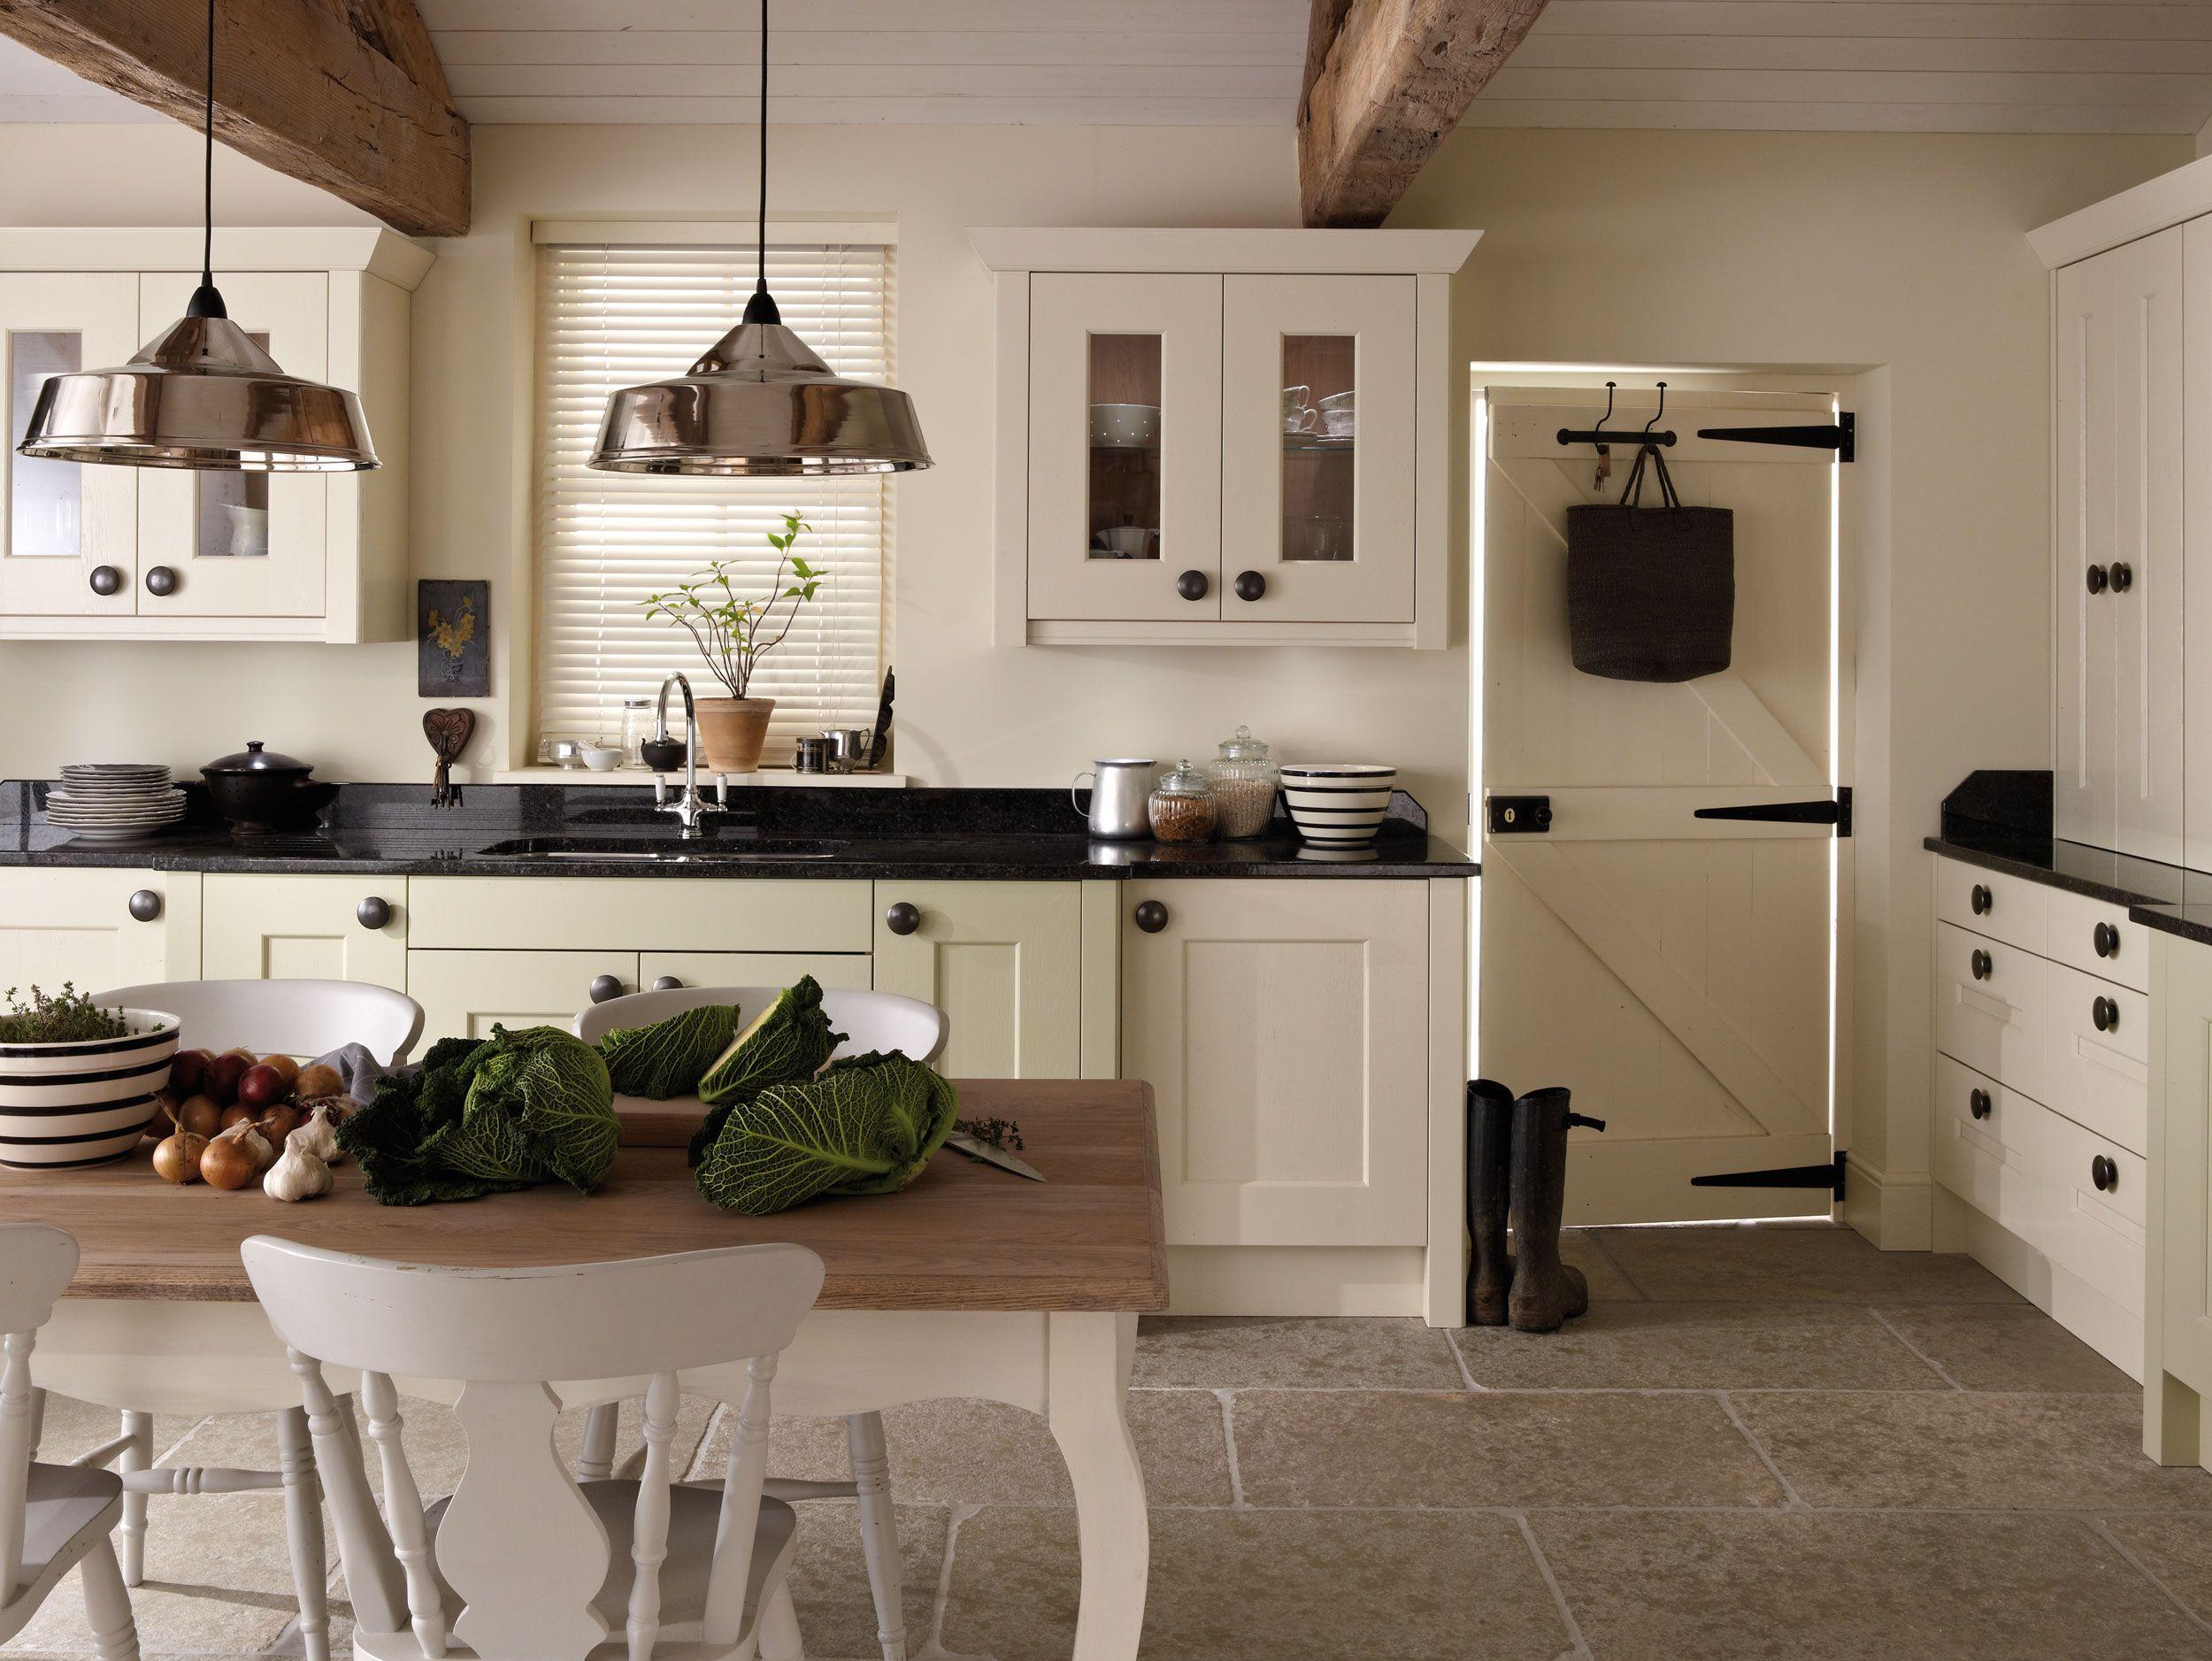 Vivacious White Cream Kitchen Cabinet And Black Marble Countertop